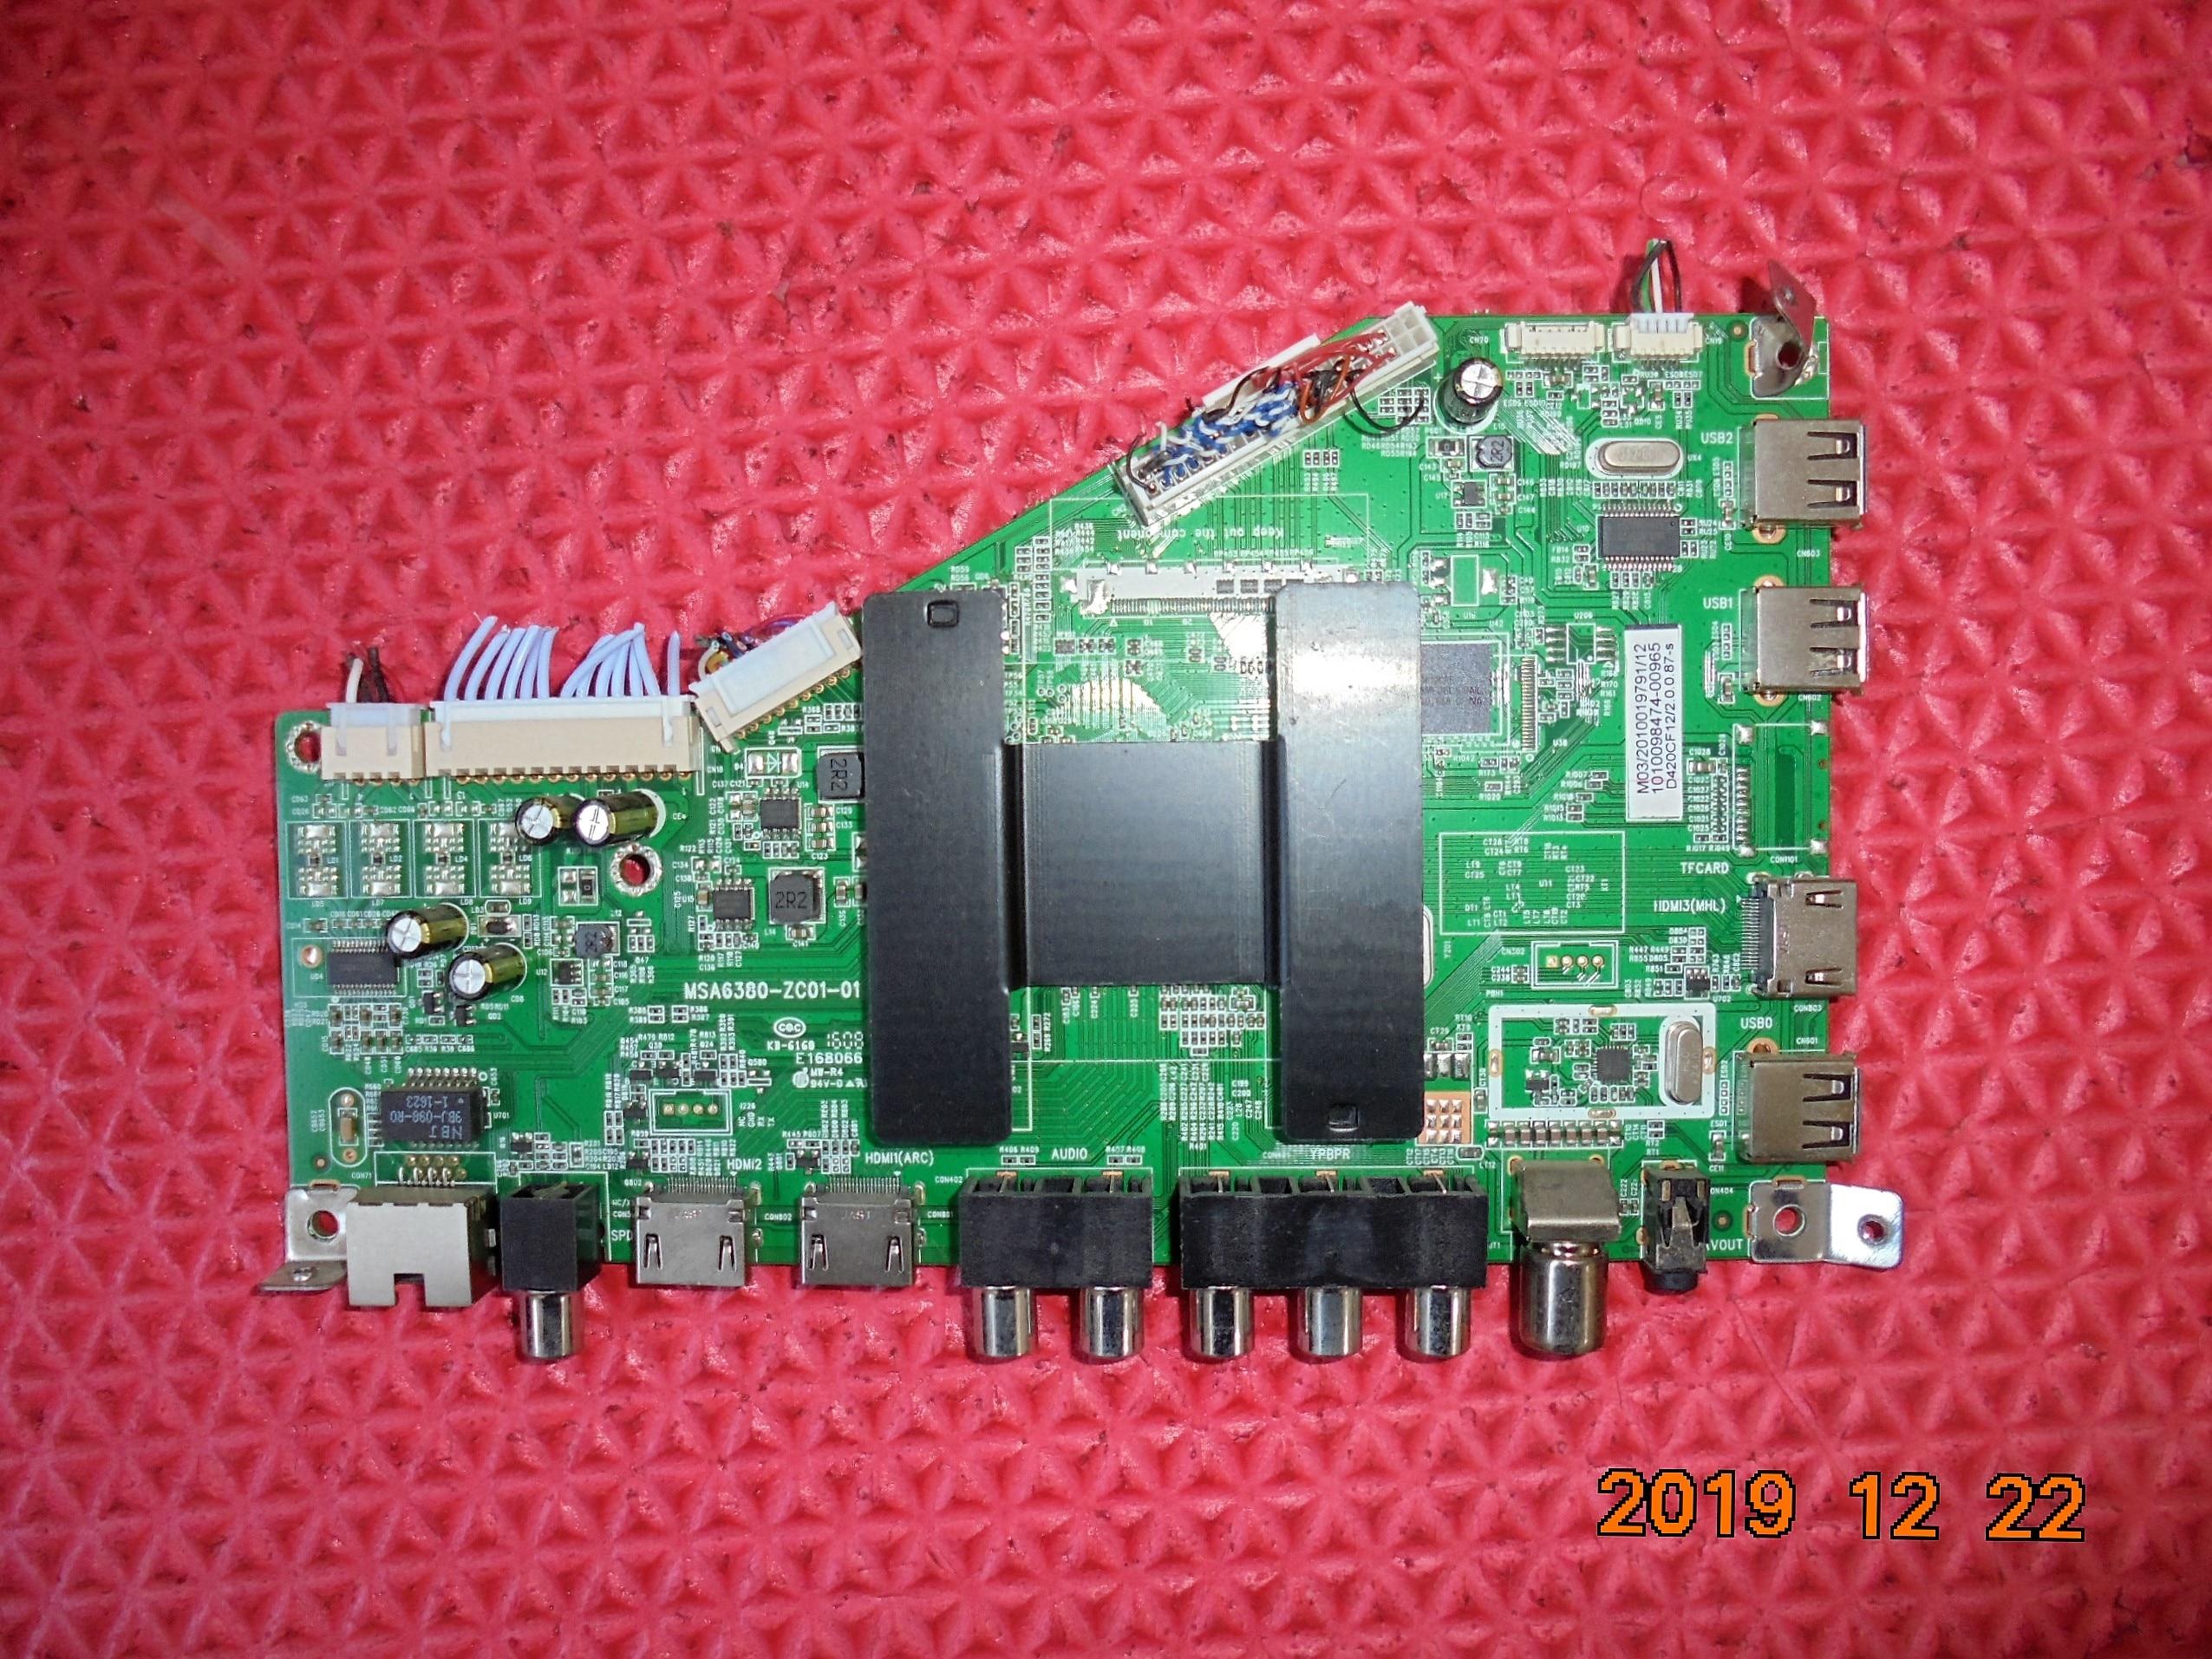 LE42B310G LCD tablero principal de TV MSA6380-ZC01-01 pantalla V420HJ2-P01